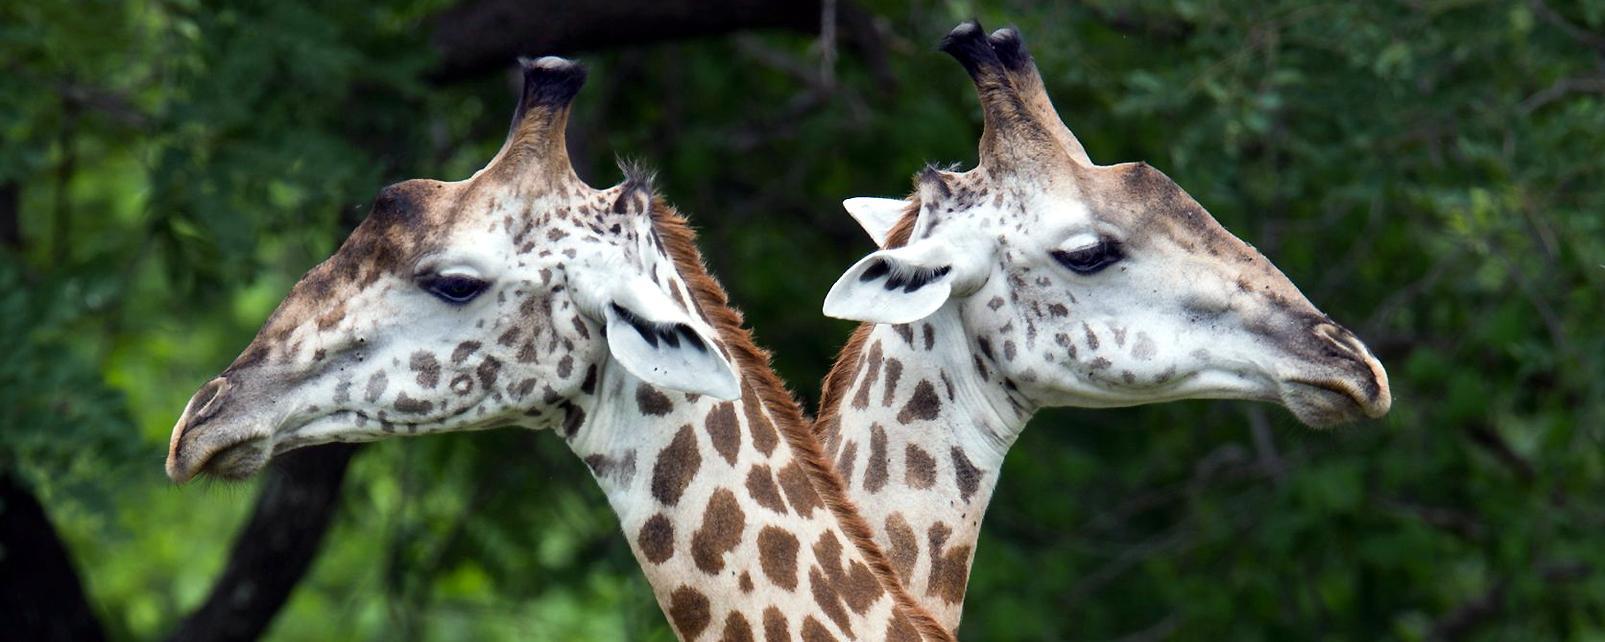 Afrique, Tanzanie, girafe, savane, arbre,